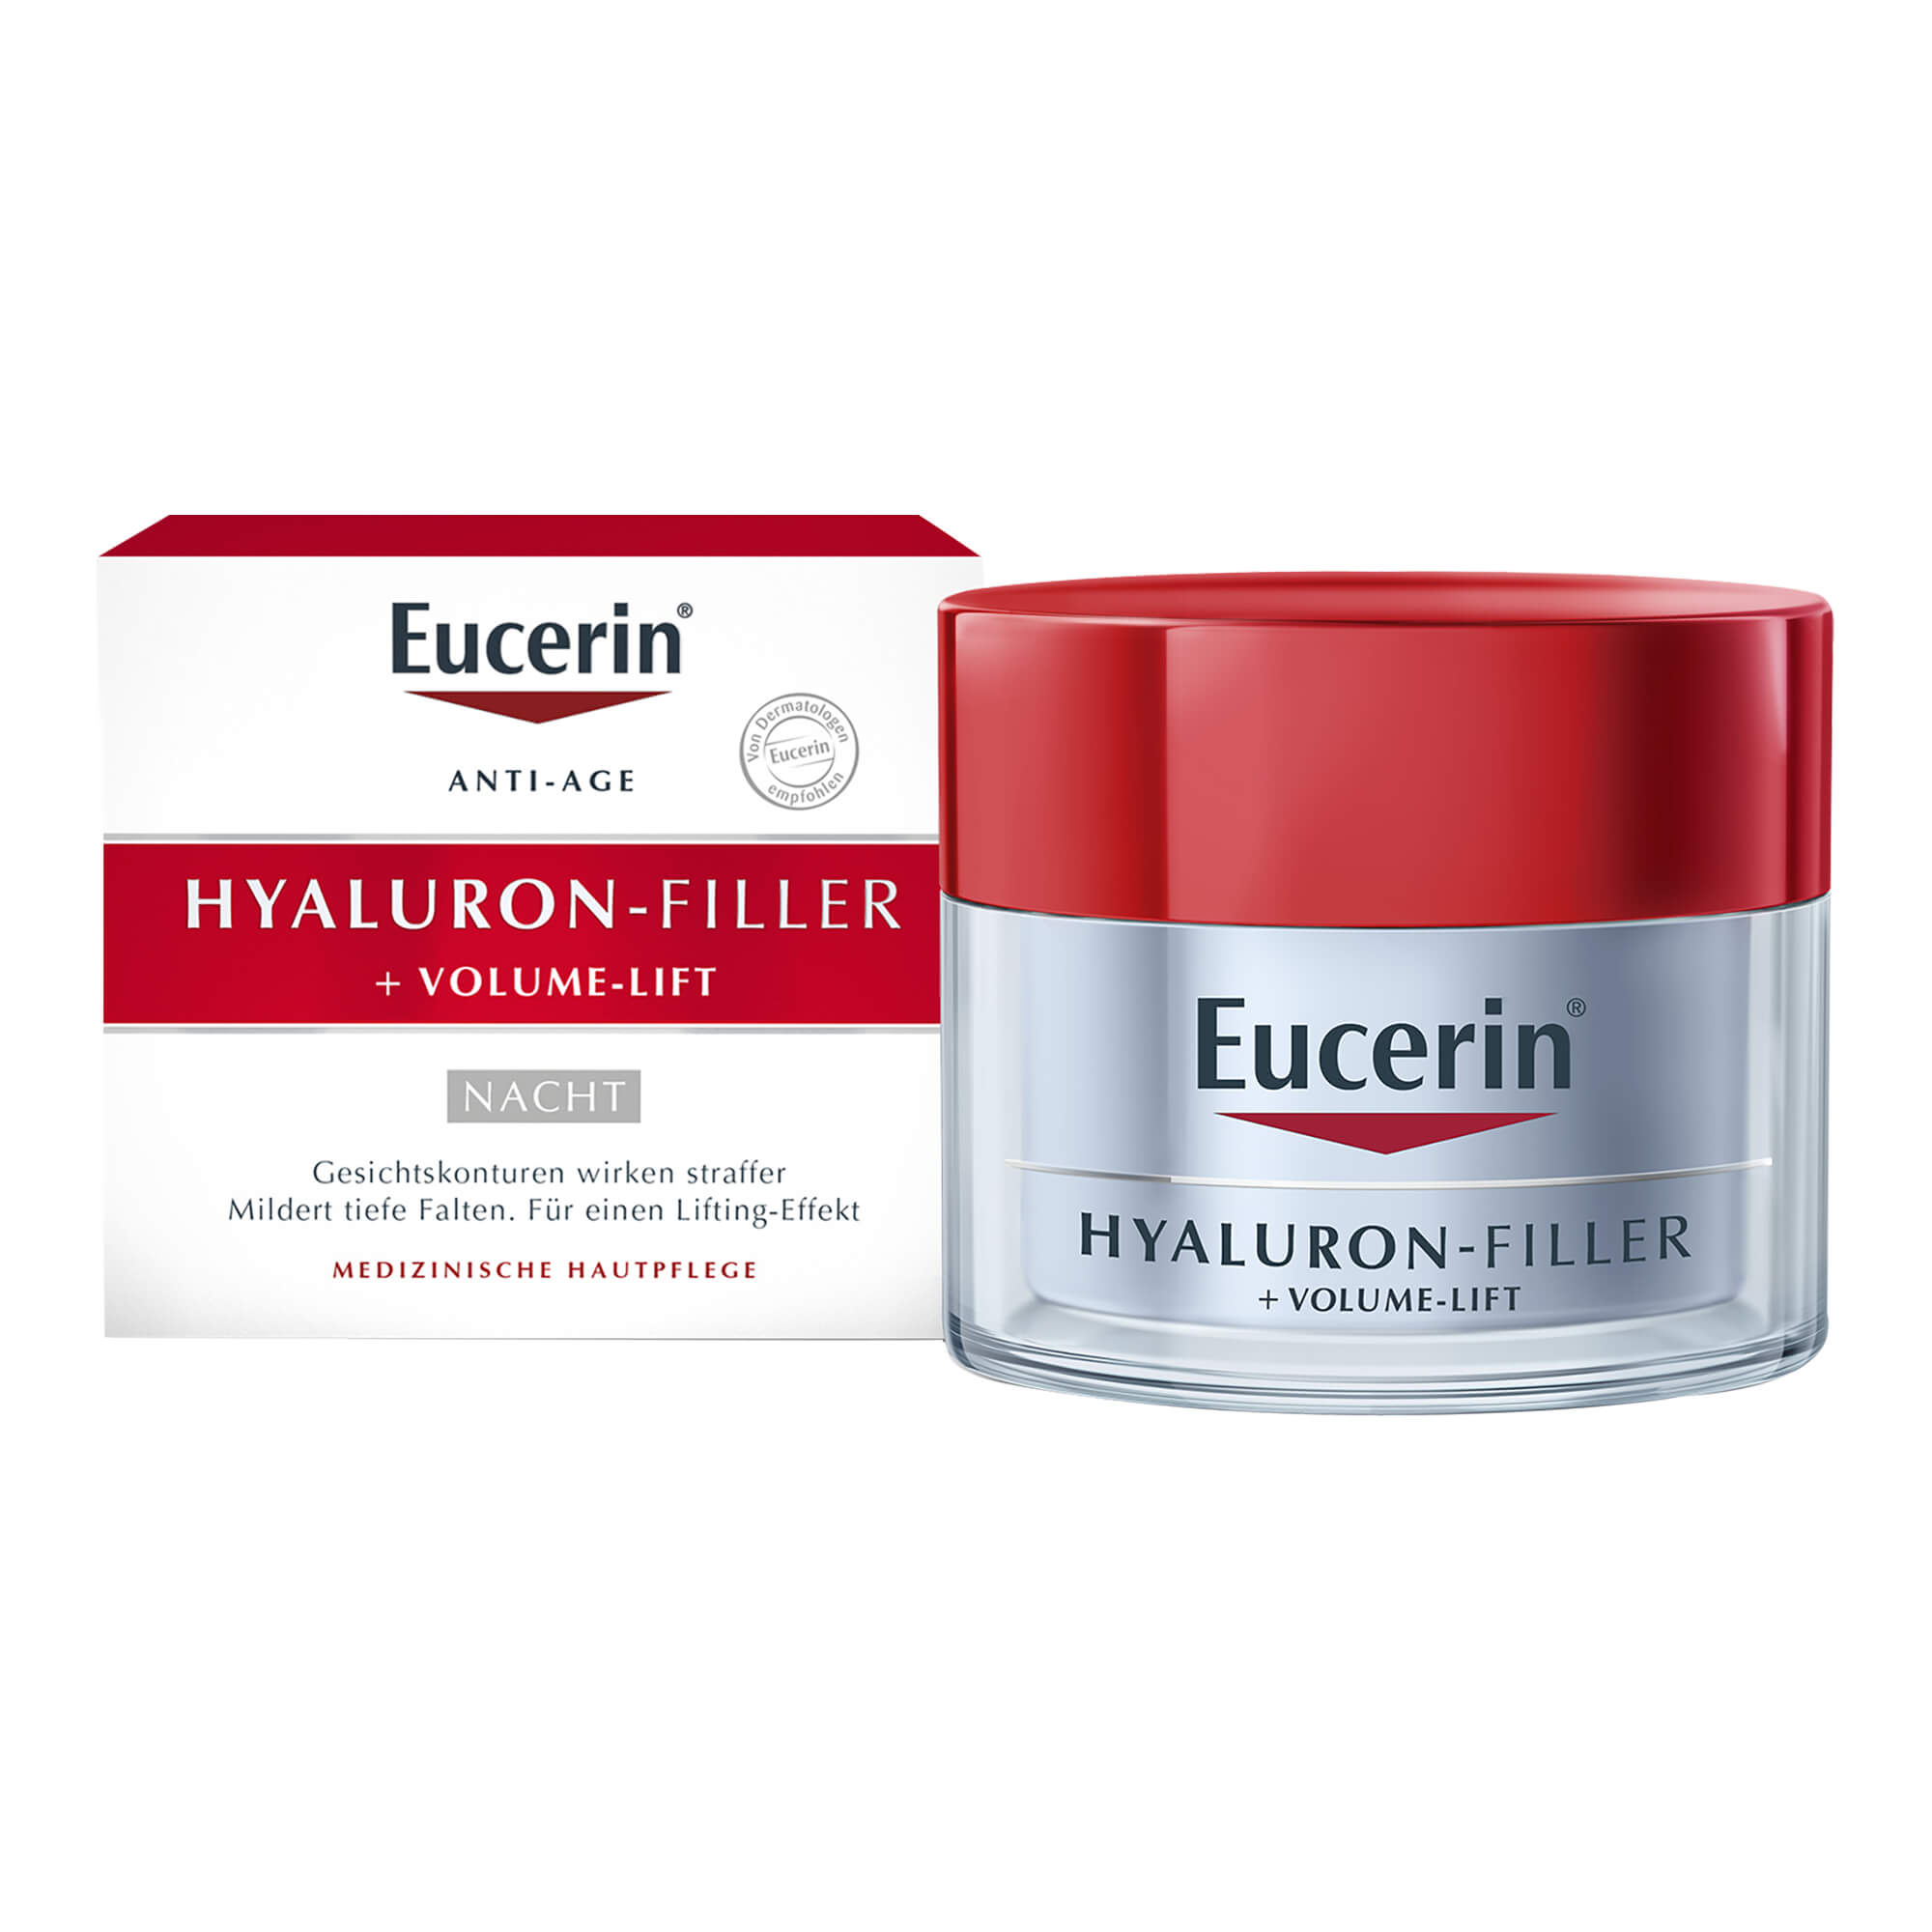 Eucerin Anti-Age Volume-Filler Nachtcreme